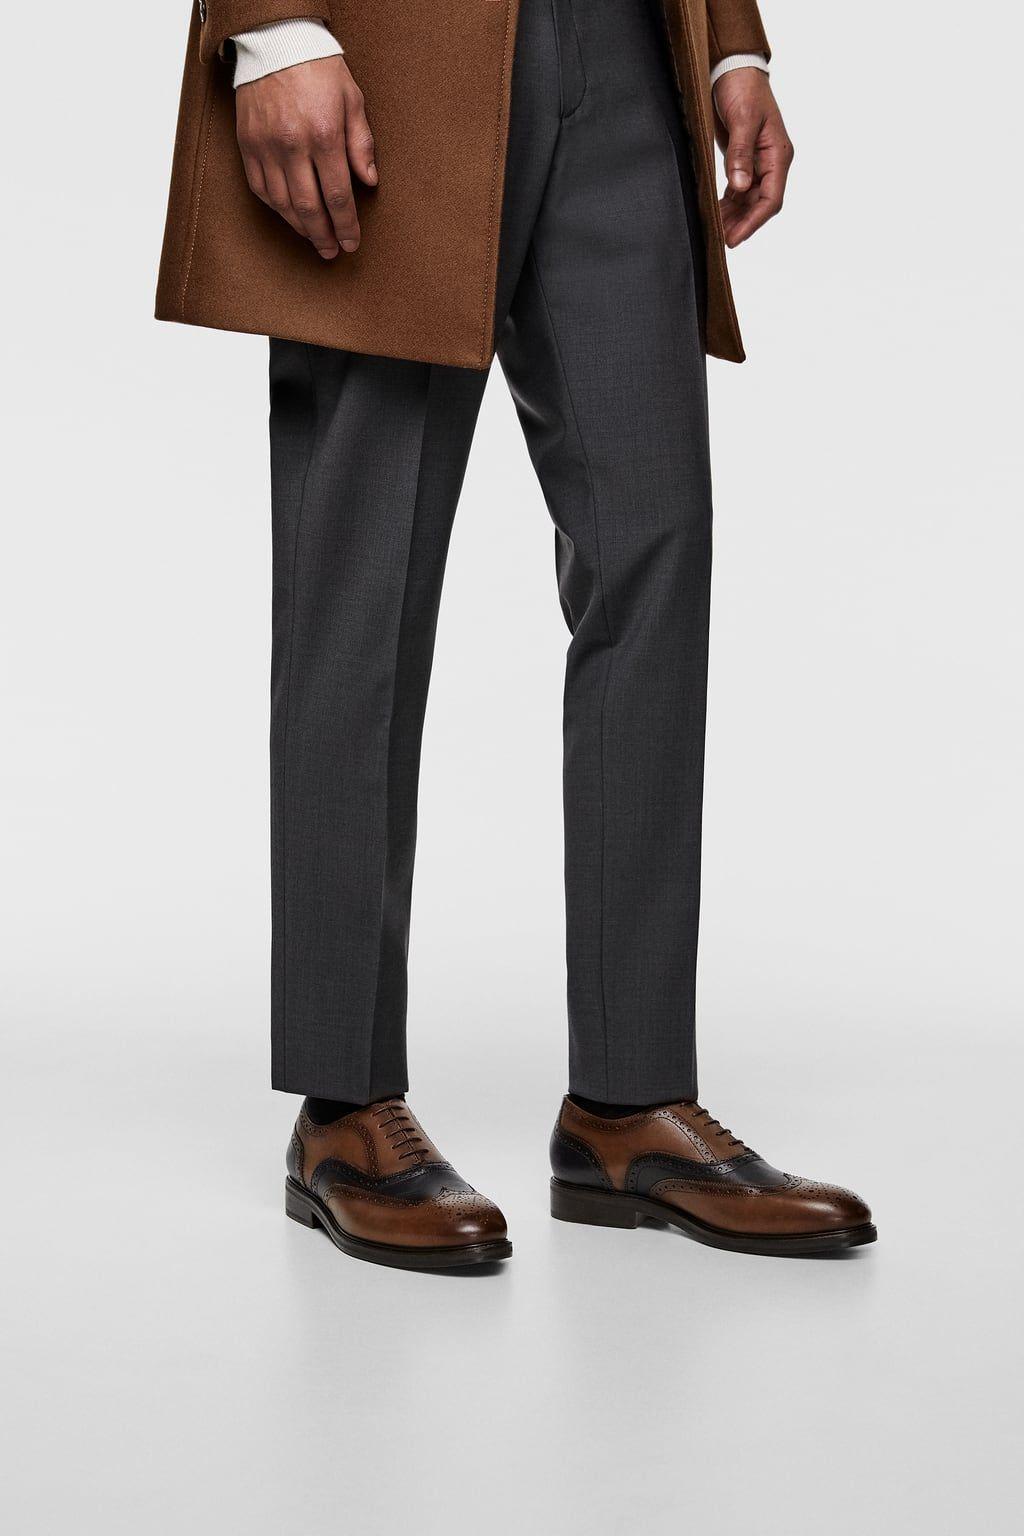 1e81e89954 Men's Leather Shoes | New Collection Online | ZARA United Kingdom ...